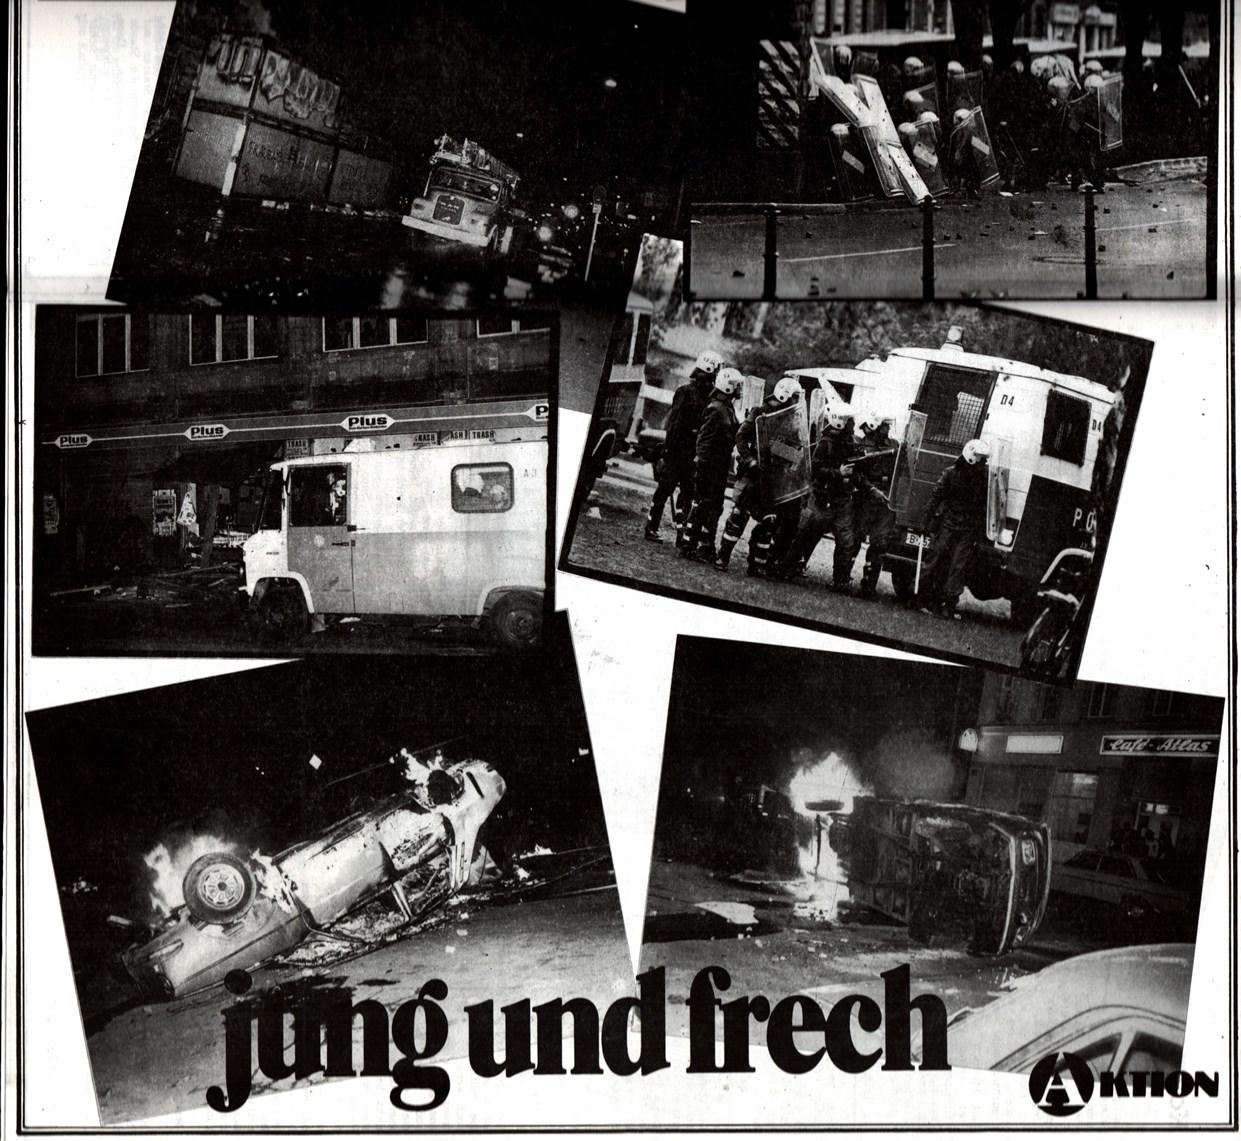 Frankfurt_Aktion_19870600_003_029